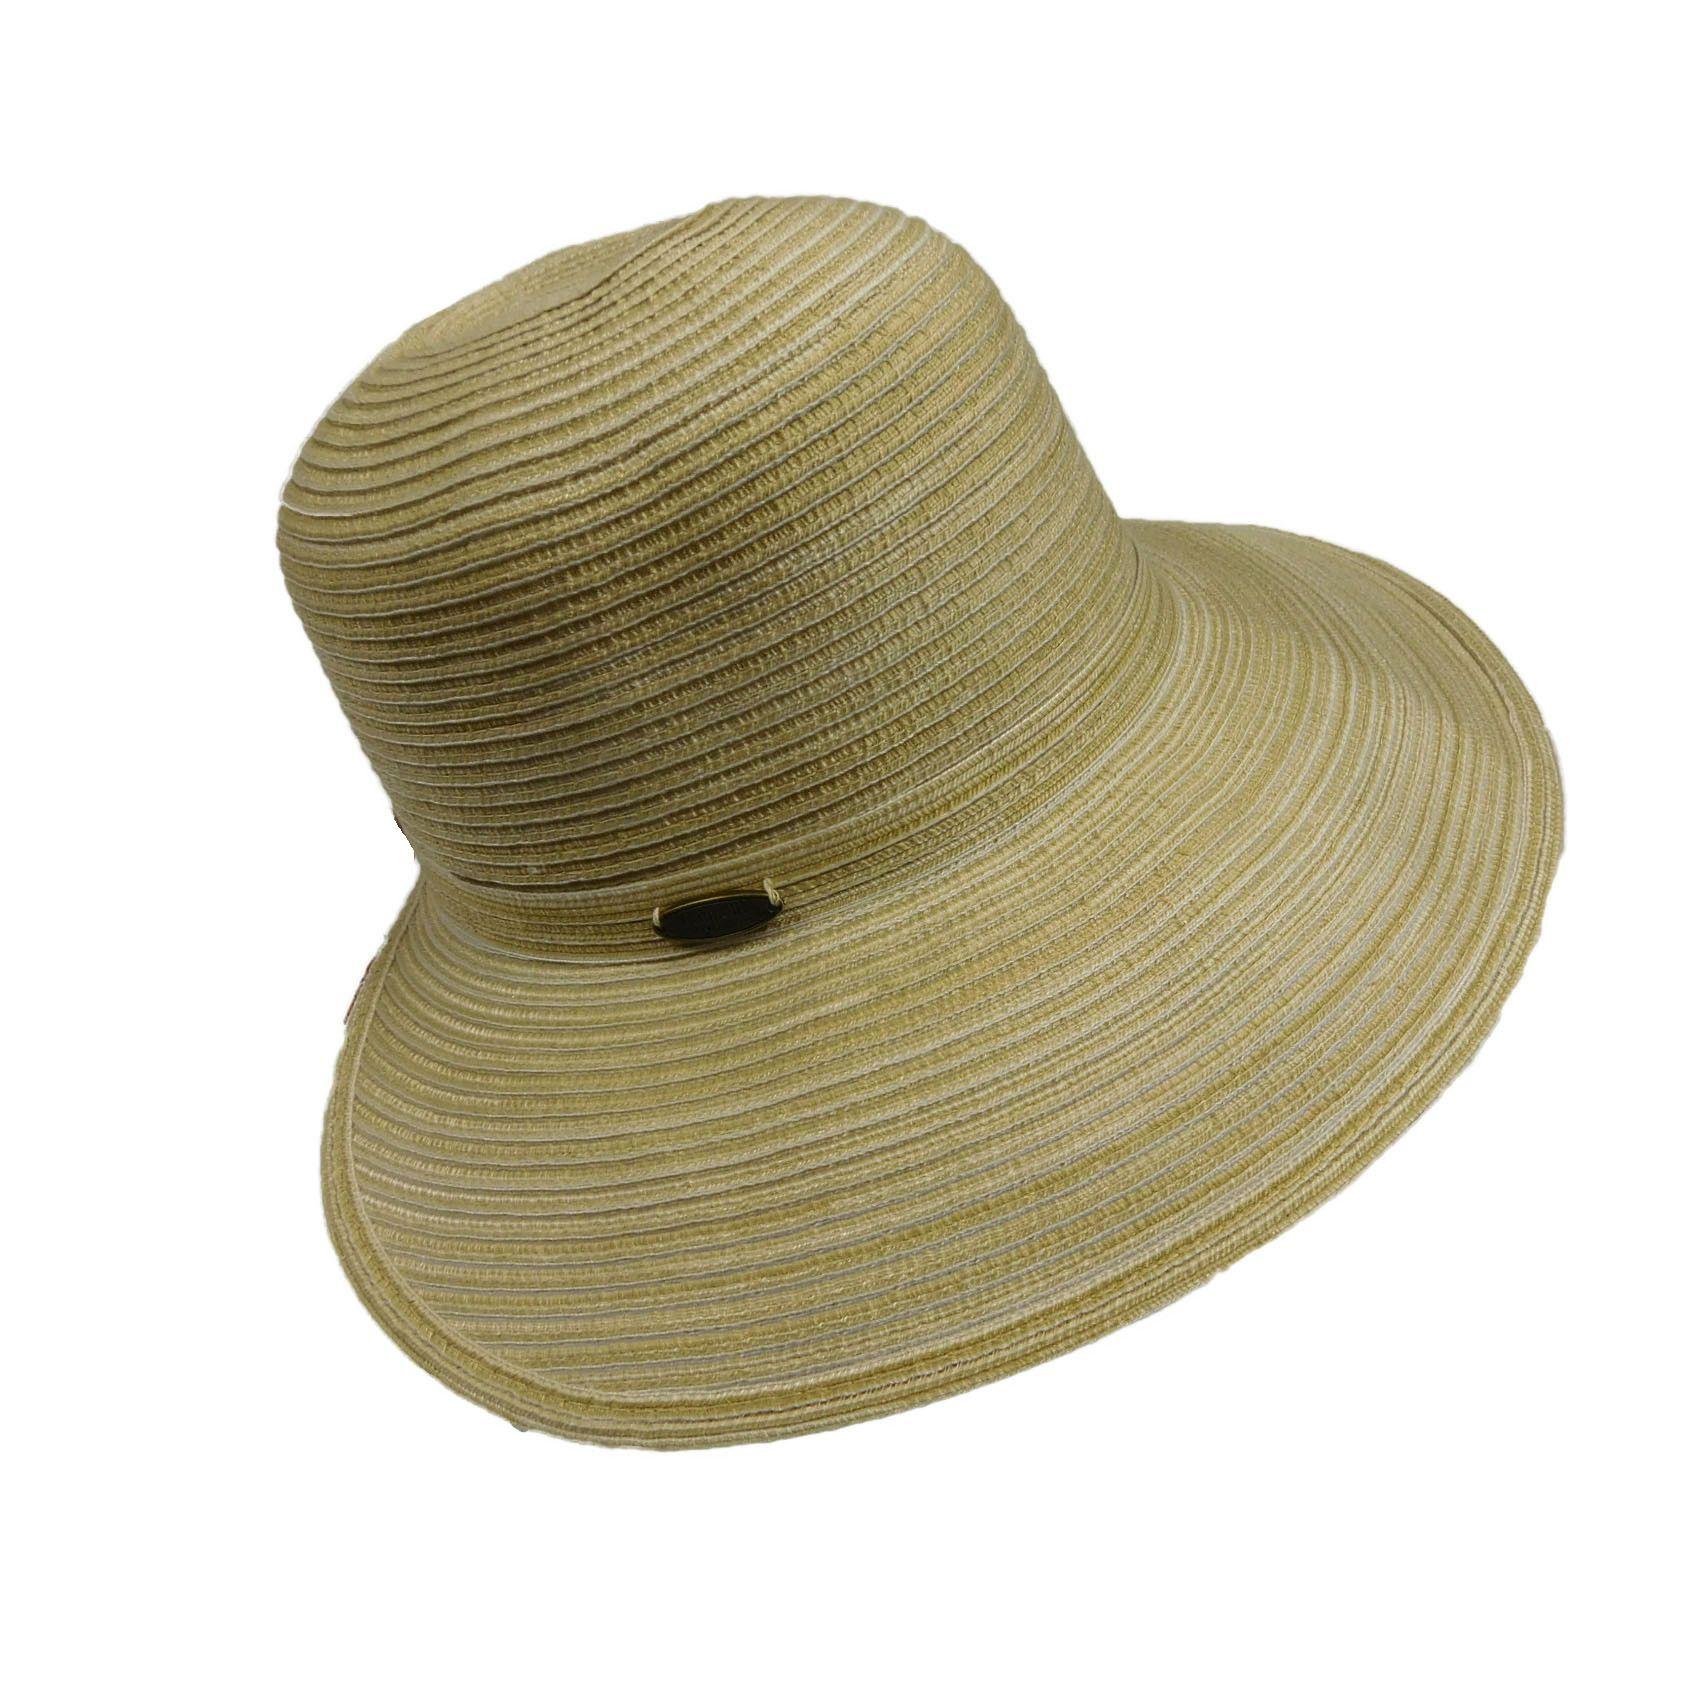 3606e9faac448 Cappelli Poly Braid Facesaver